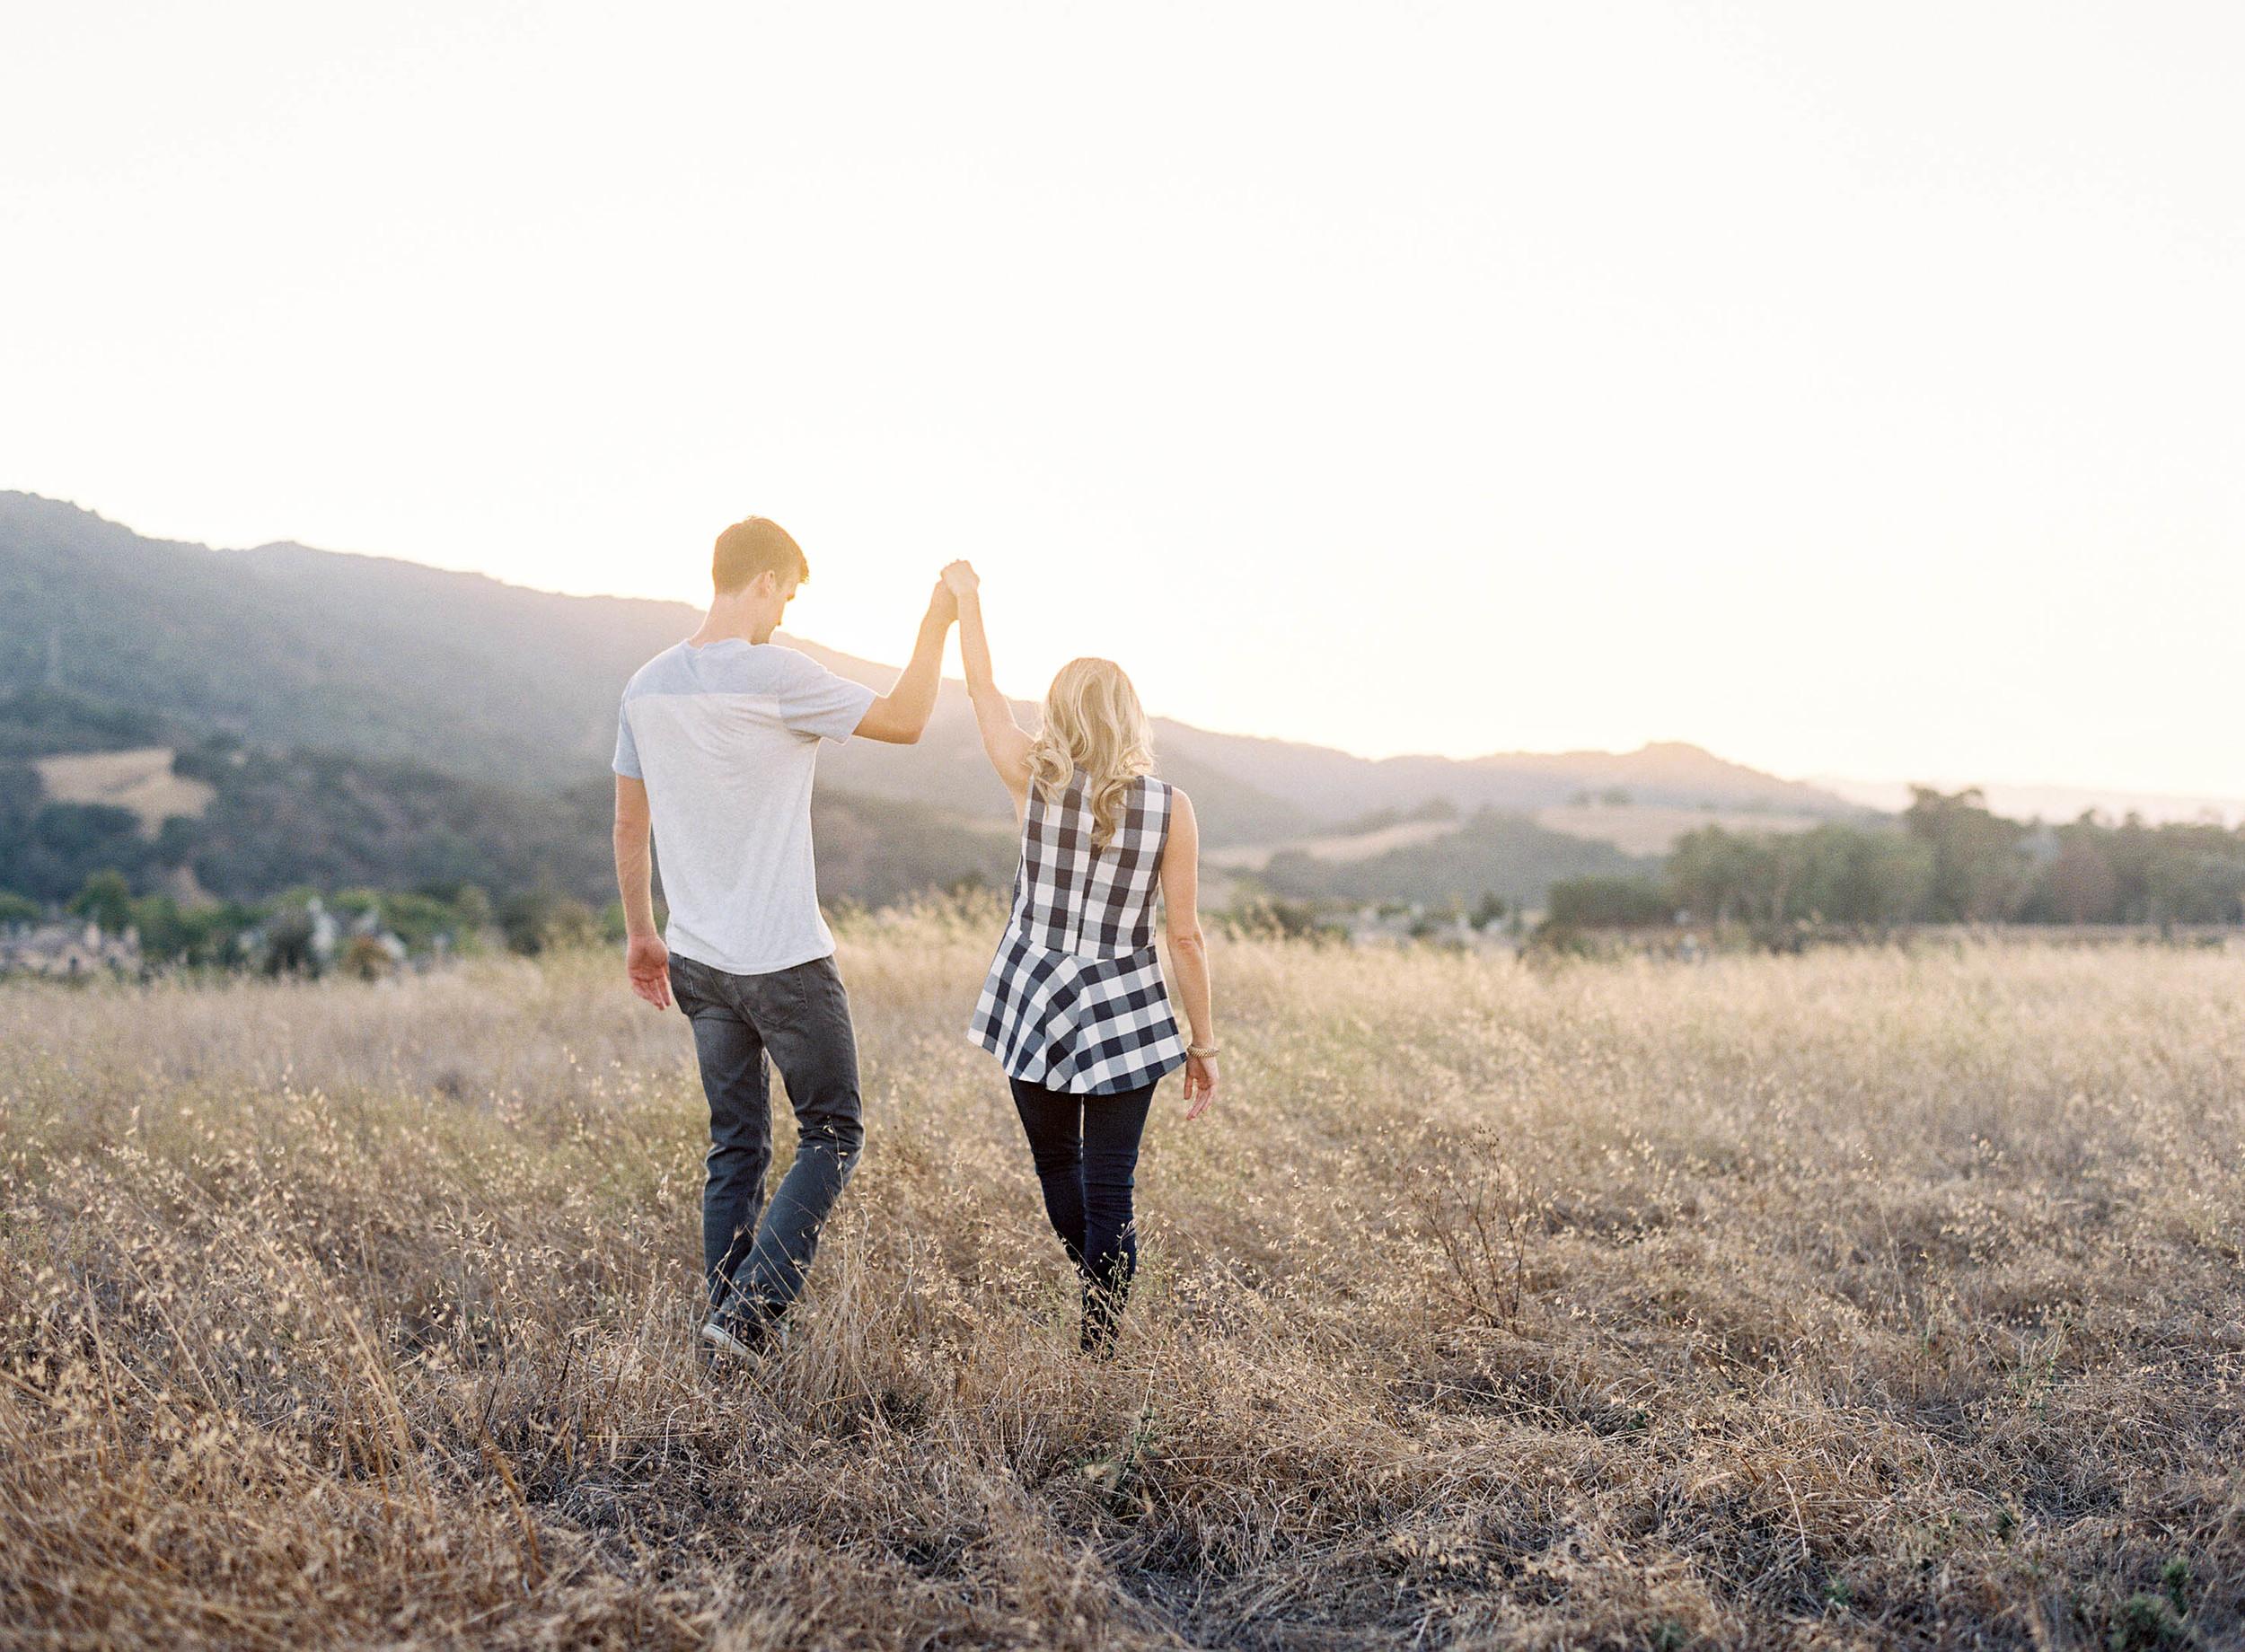 Meghan Mehan Photography - Fine Art Film Wedding Photography - San Francisco   Napa   Sonoma   Big Sur   Chicago   Minneapolis   Milwaukee   Lake Geneva   Door County   Wisconsin 012.jpg